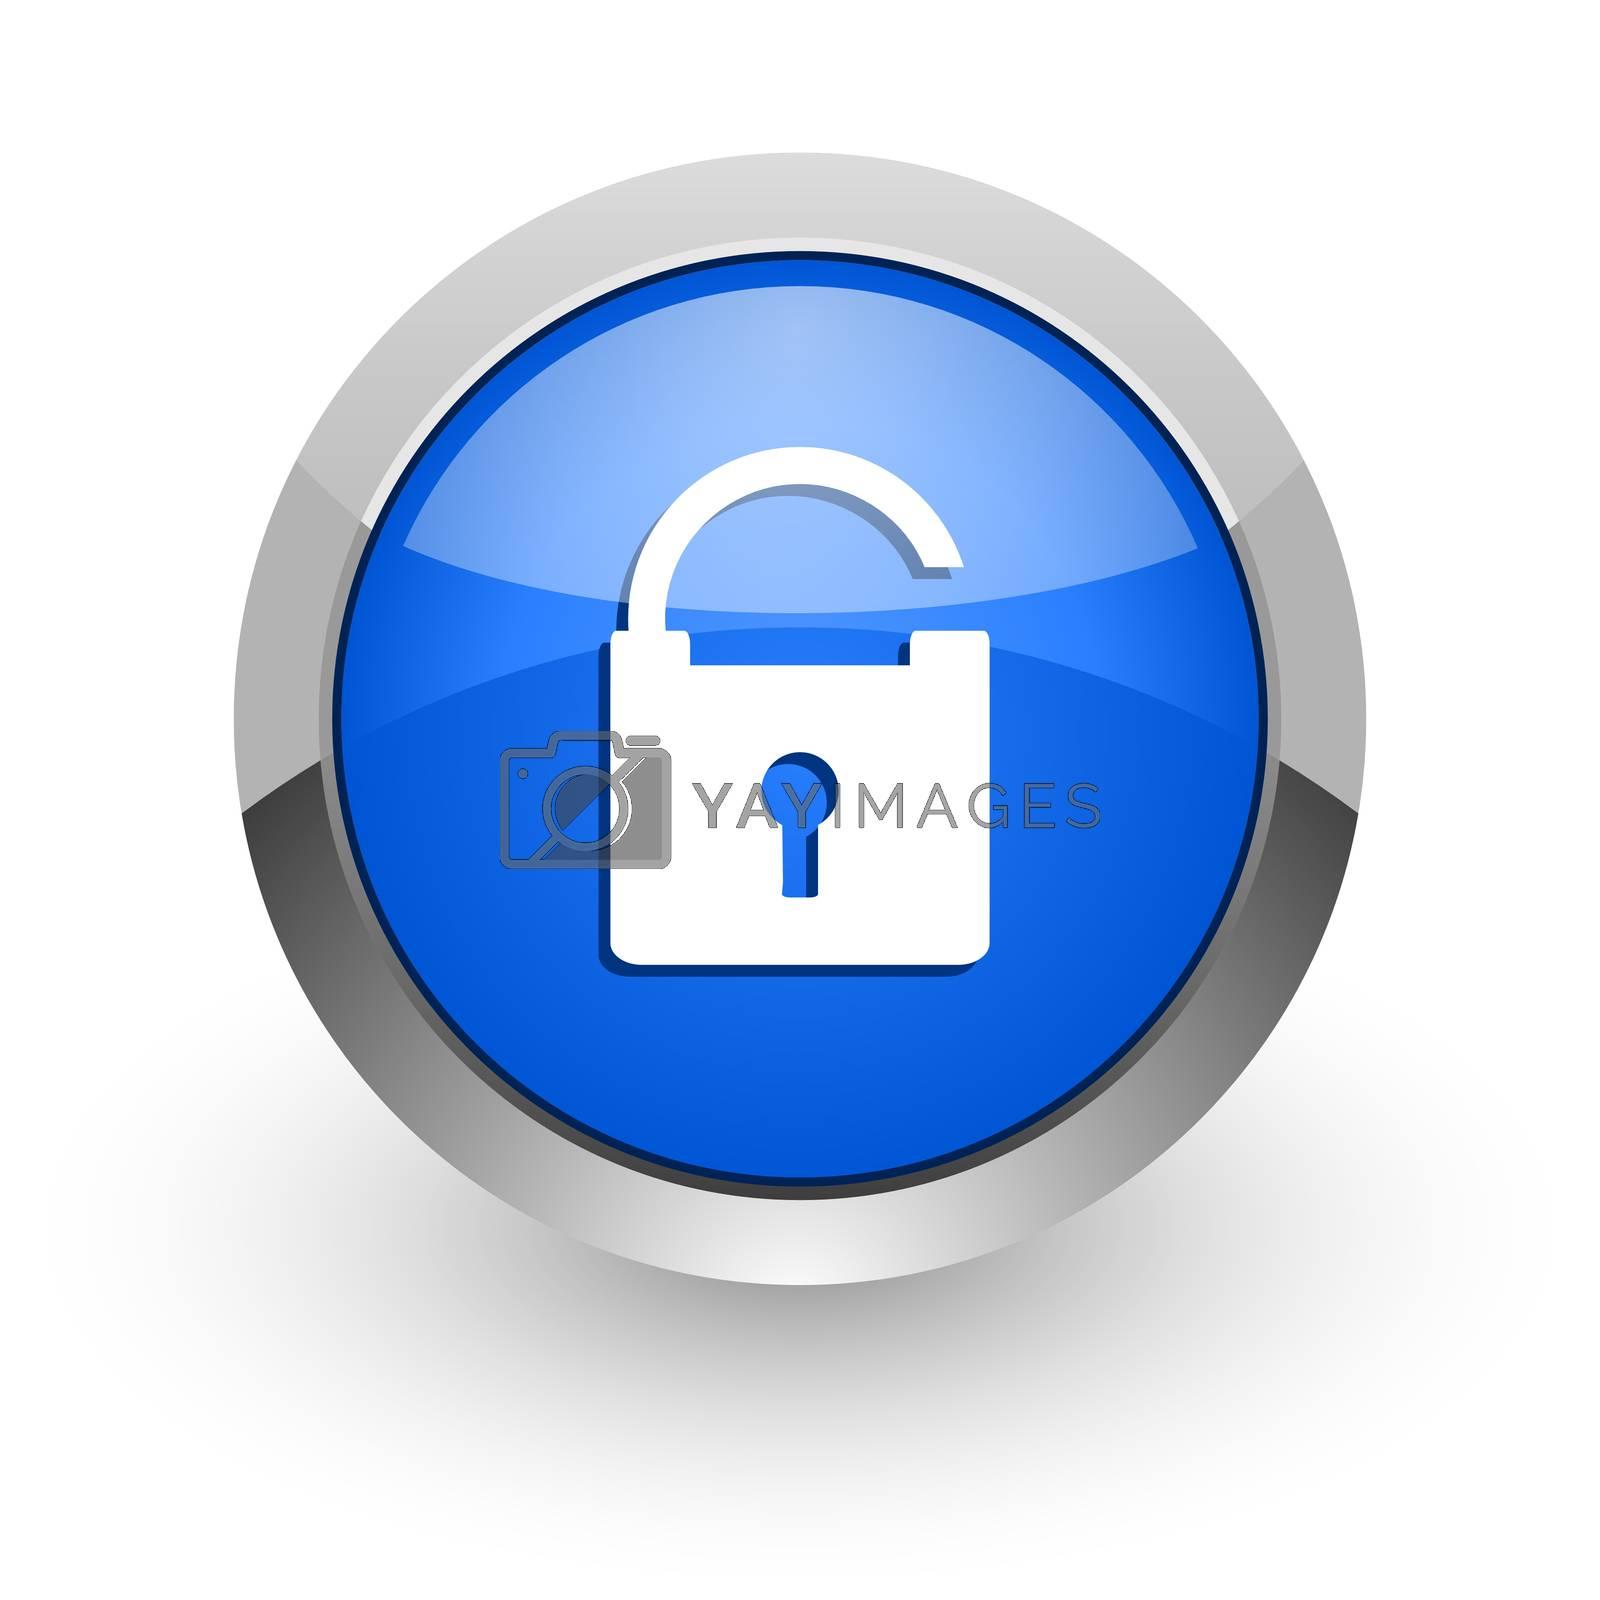 Royalty free image of padlock blue glossy web icon by alexwhite